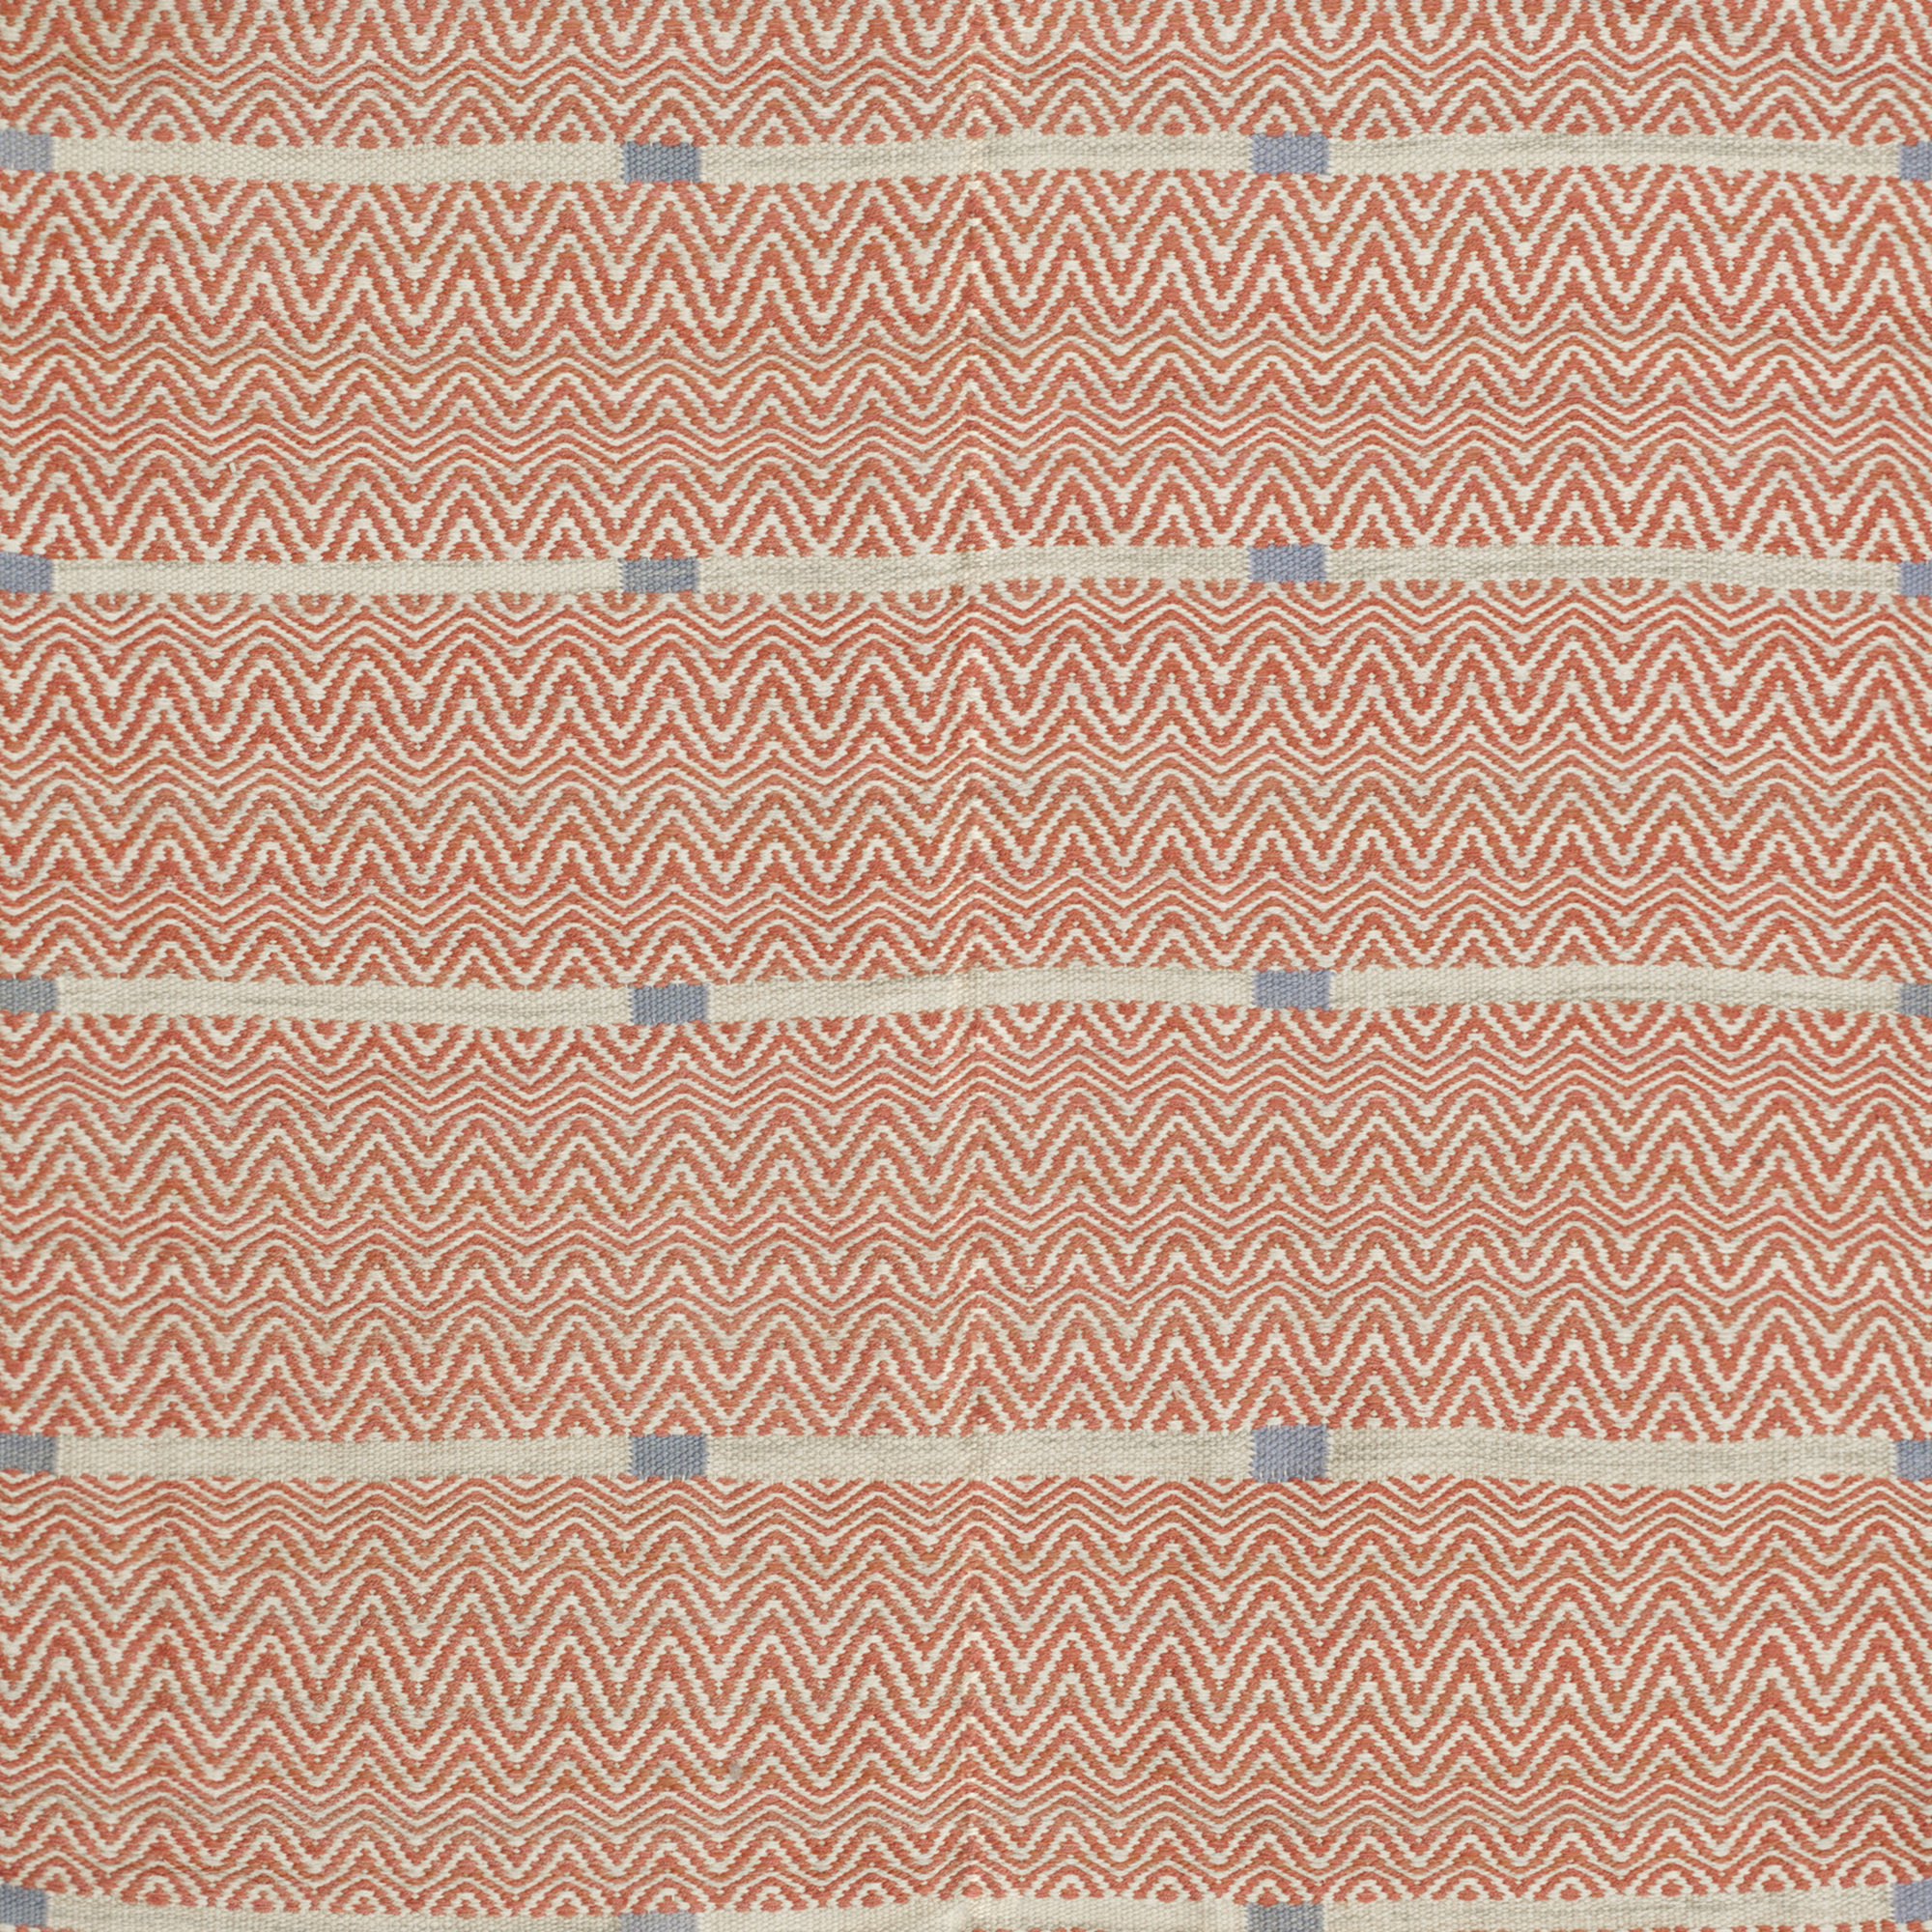 146: Barbro Nilsson / Rosengång carpet (2 of 2)